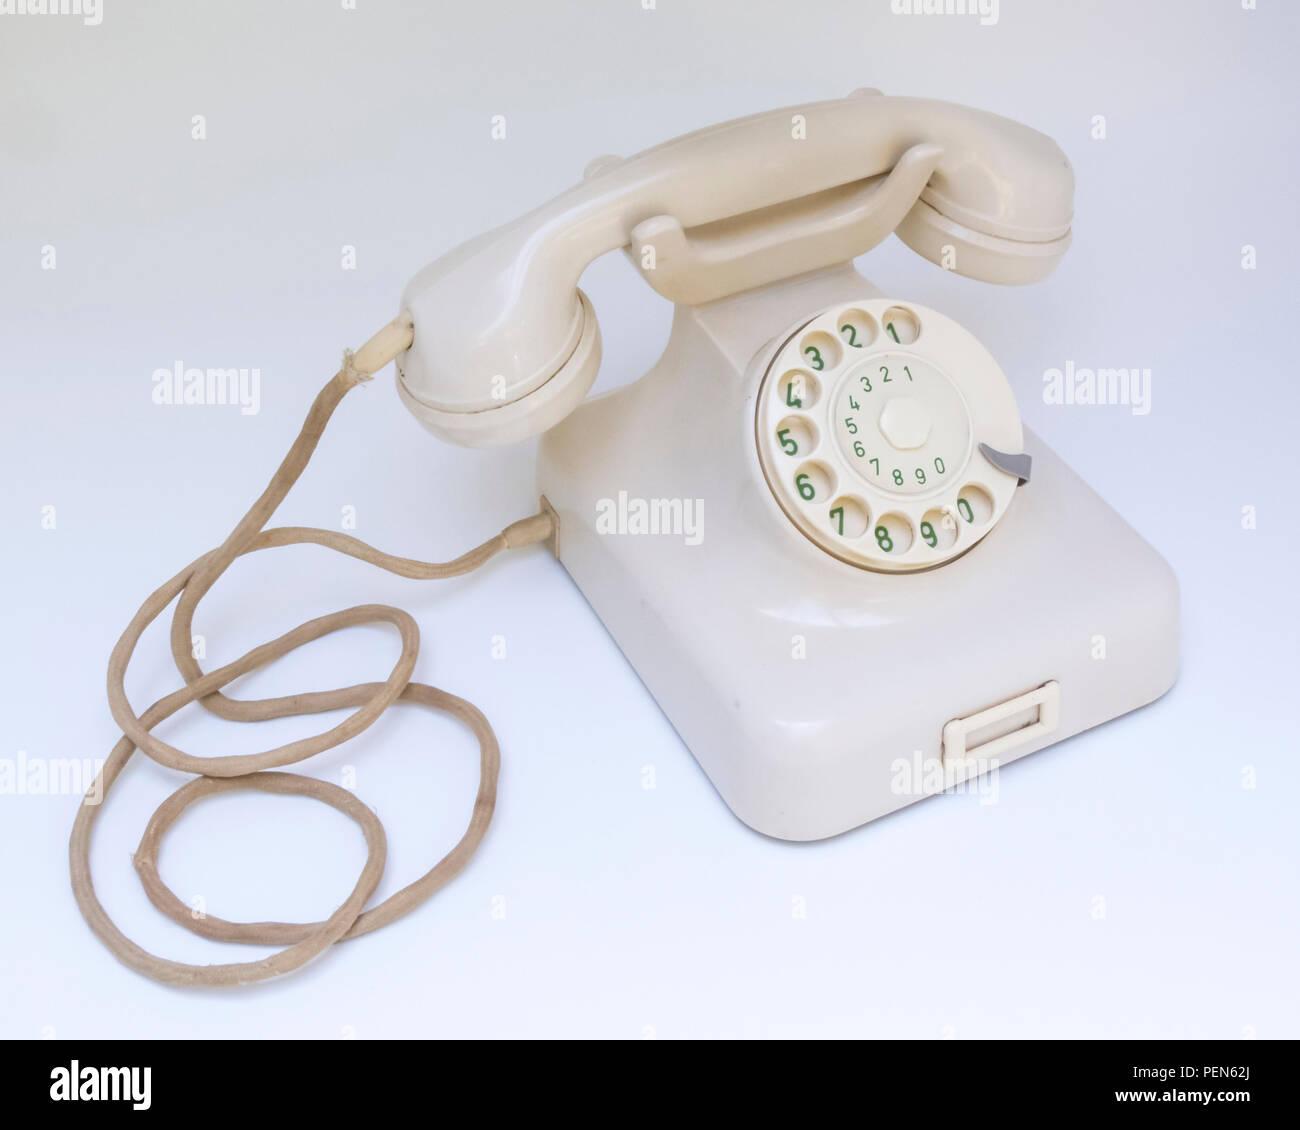 Antikes elfenbeinfarbiges Telefon W48 aus Backelit 50er Jahre - Stock Image